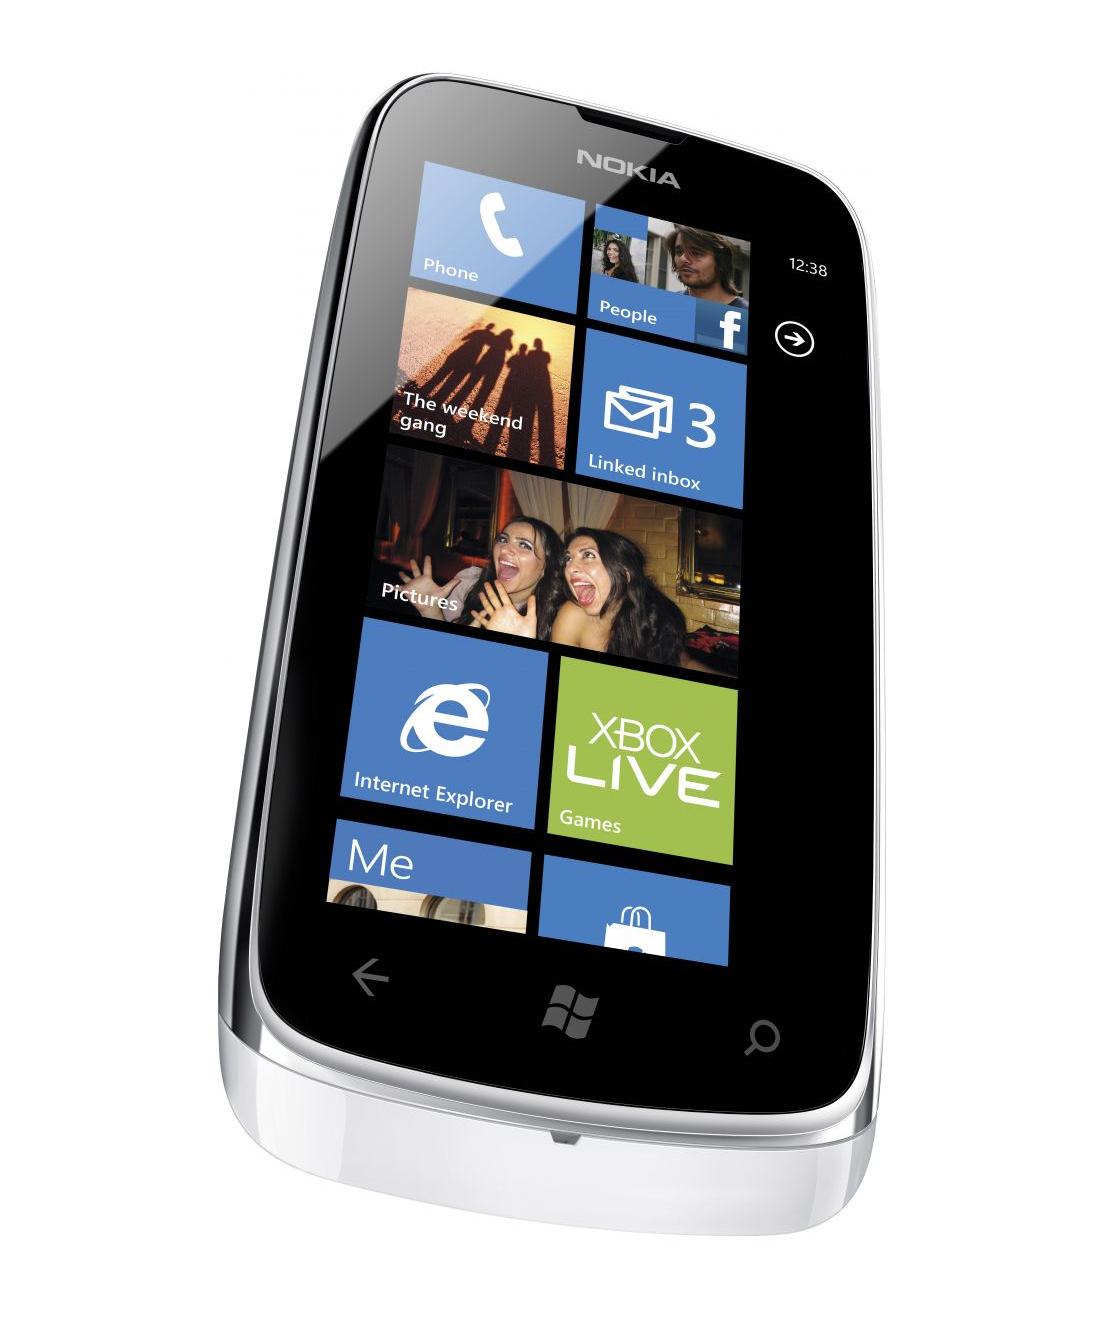 Nokia Lumia 610: Microsoft ermöglicht Billig-Windows-Phone-Smartphone - Nokia Lumia 610